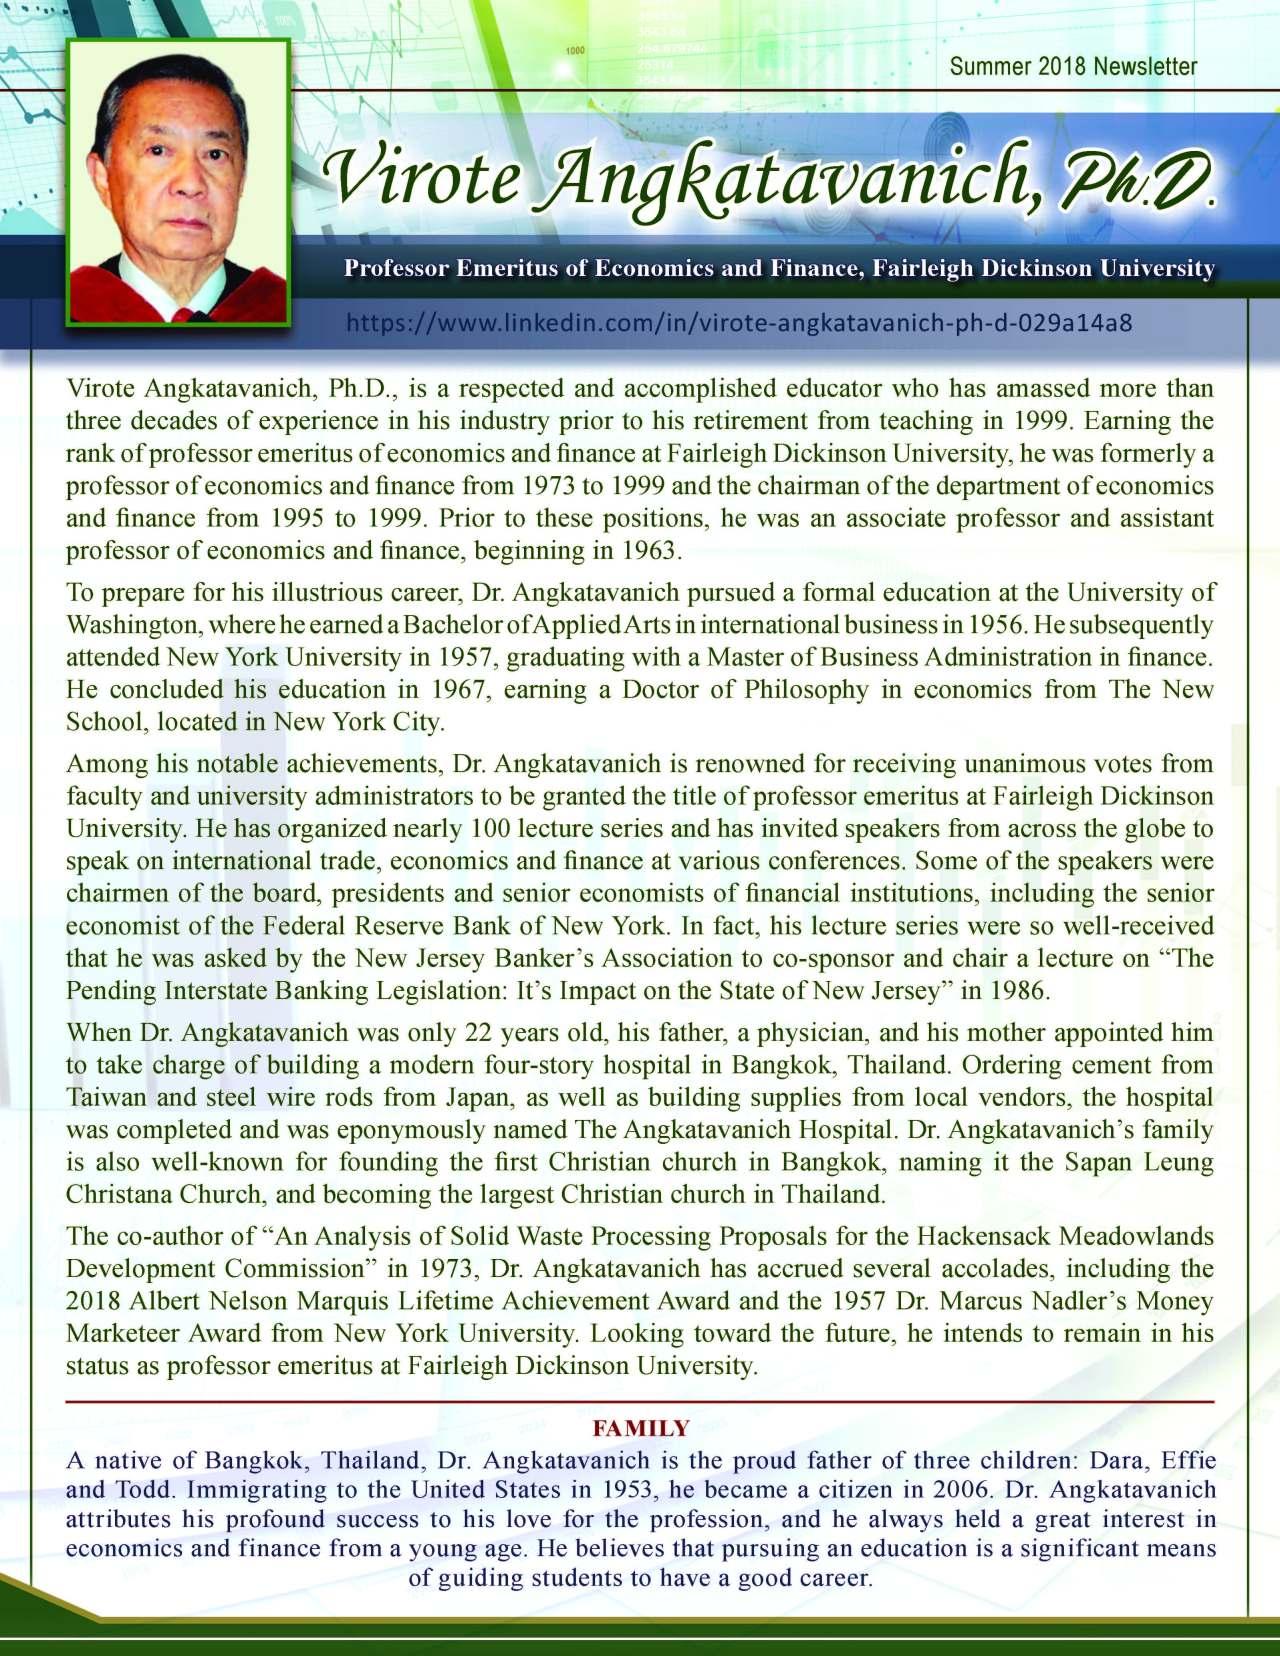 Angkatavanich, Virote 3770294_4003770294 Newsletter.jpg